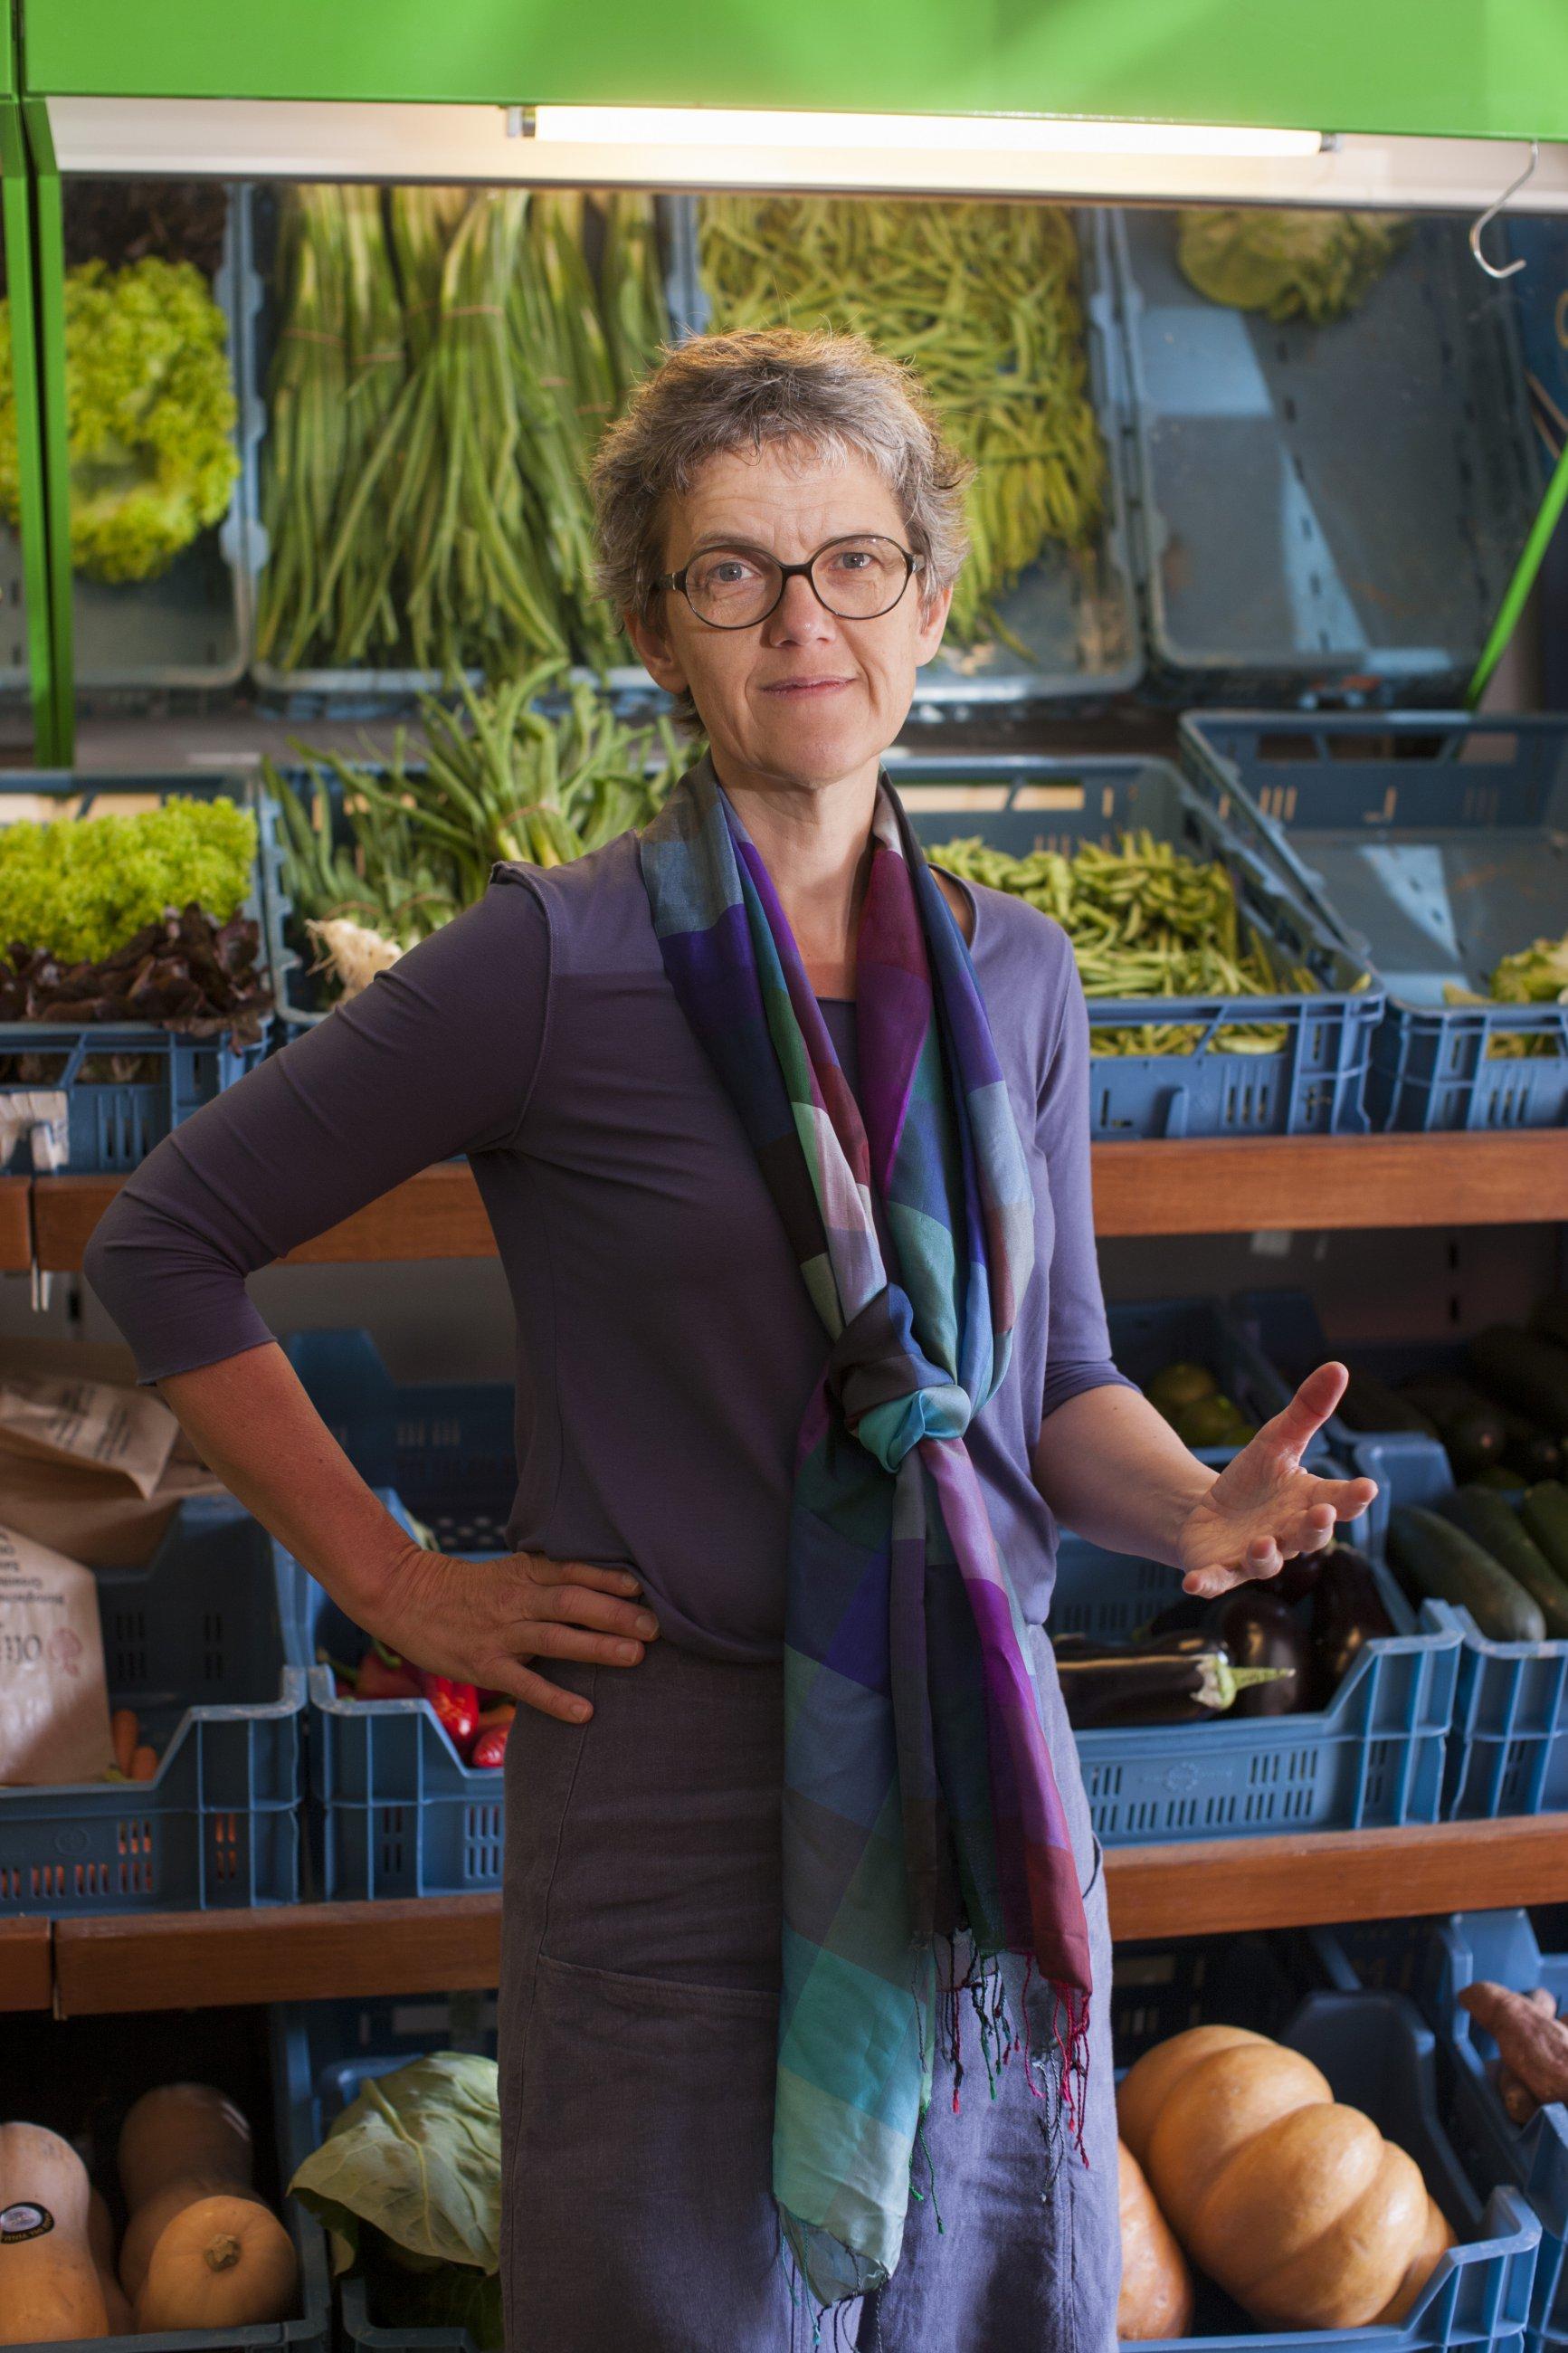 Annemarie Mol (2012)